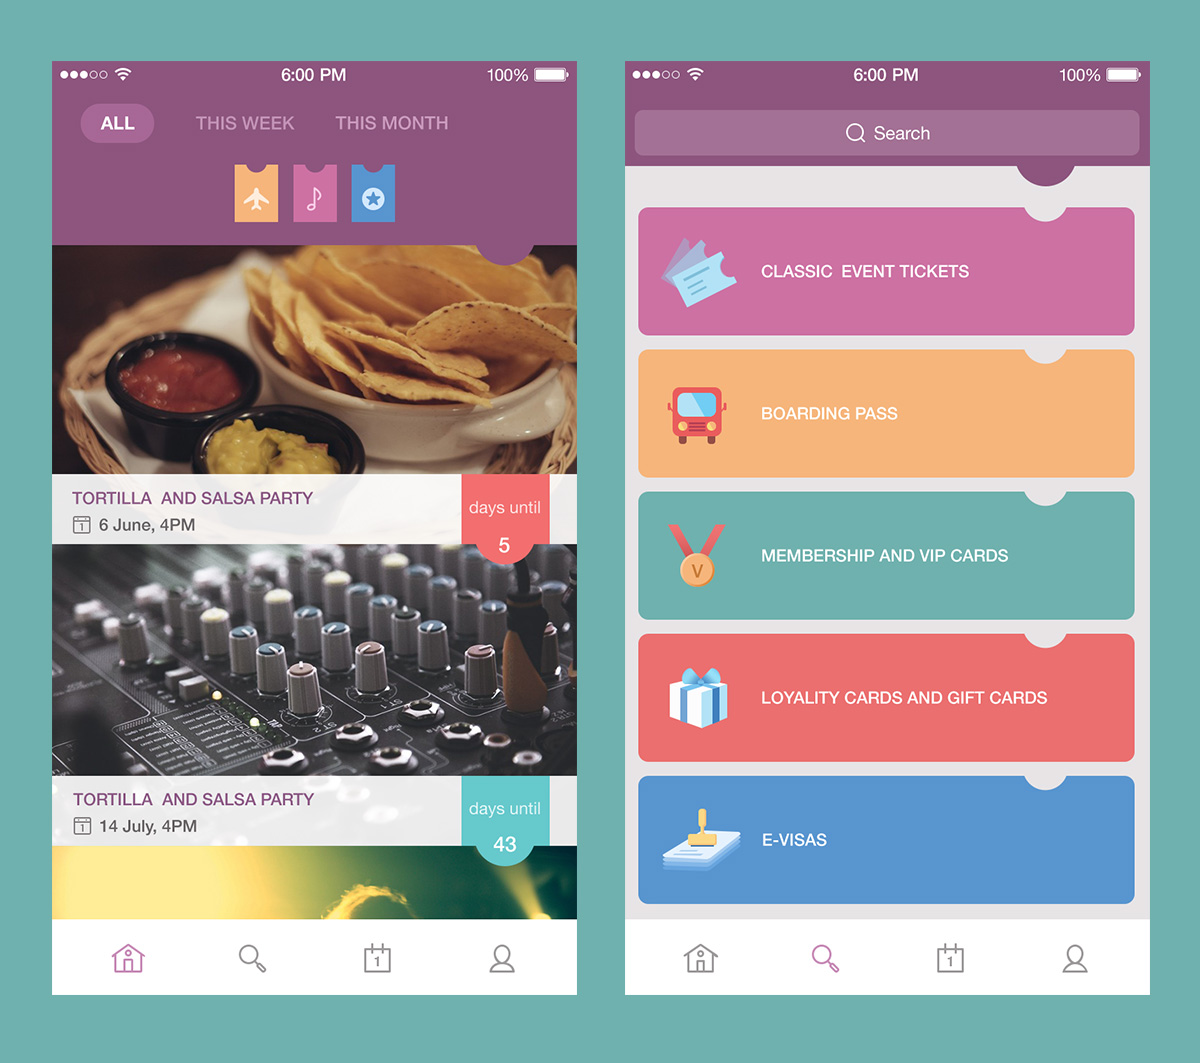 PassFold UI design by Tubik Studio